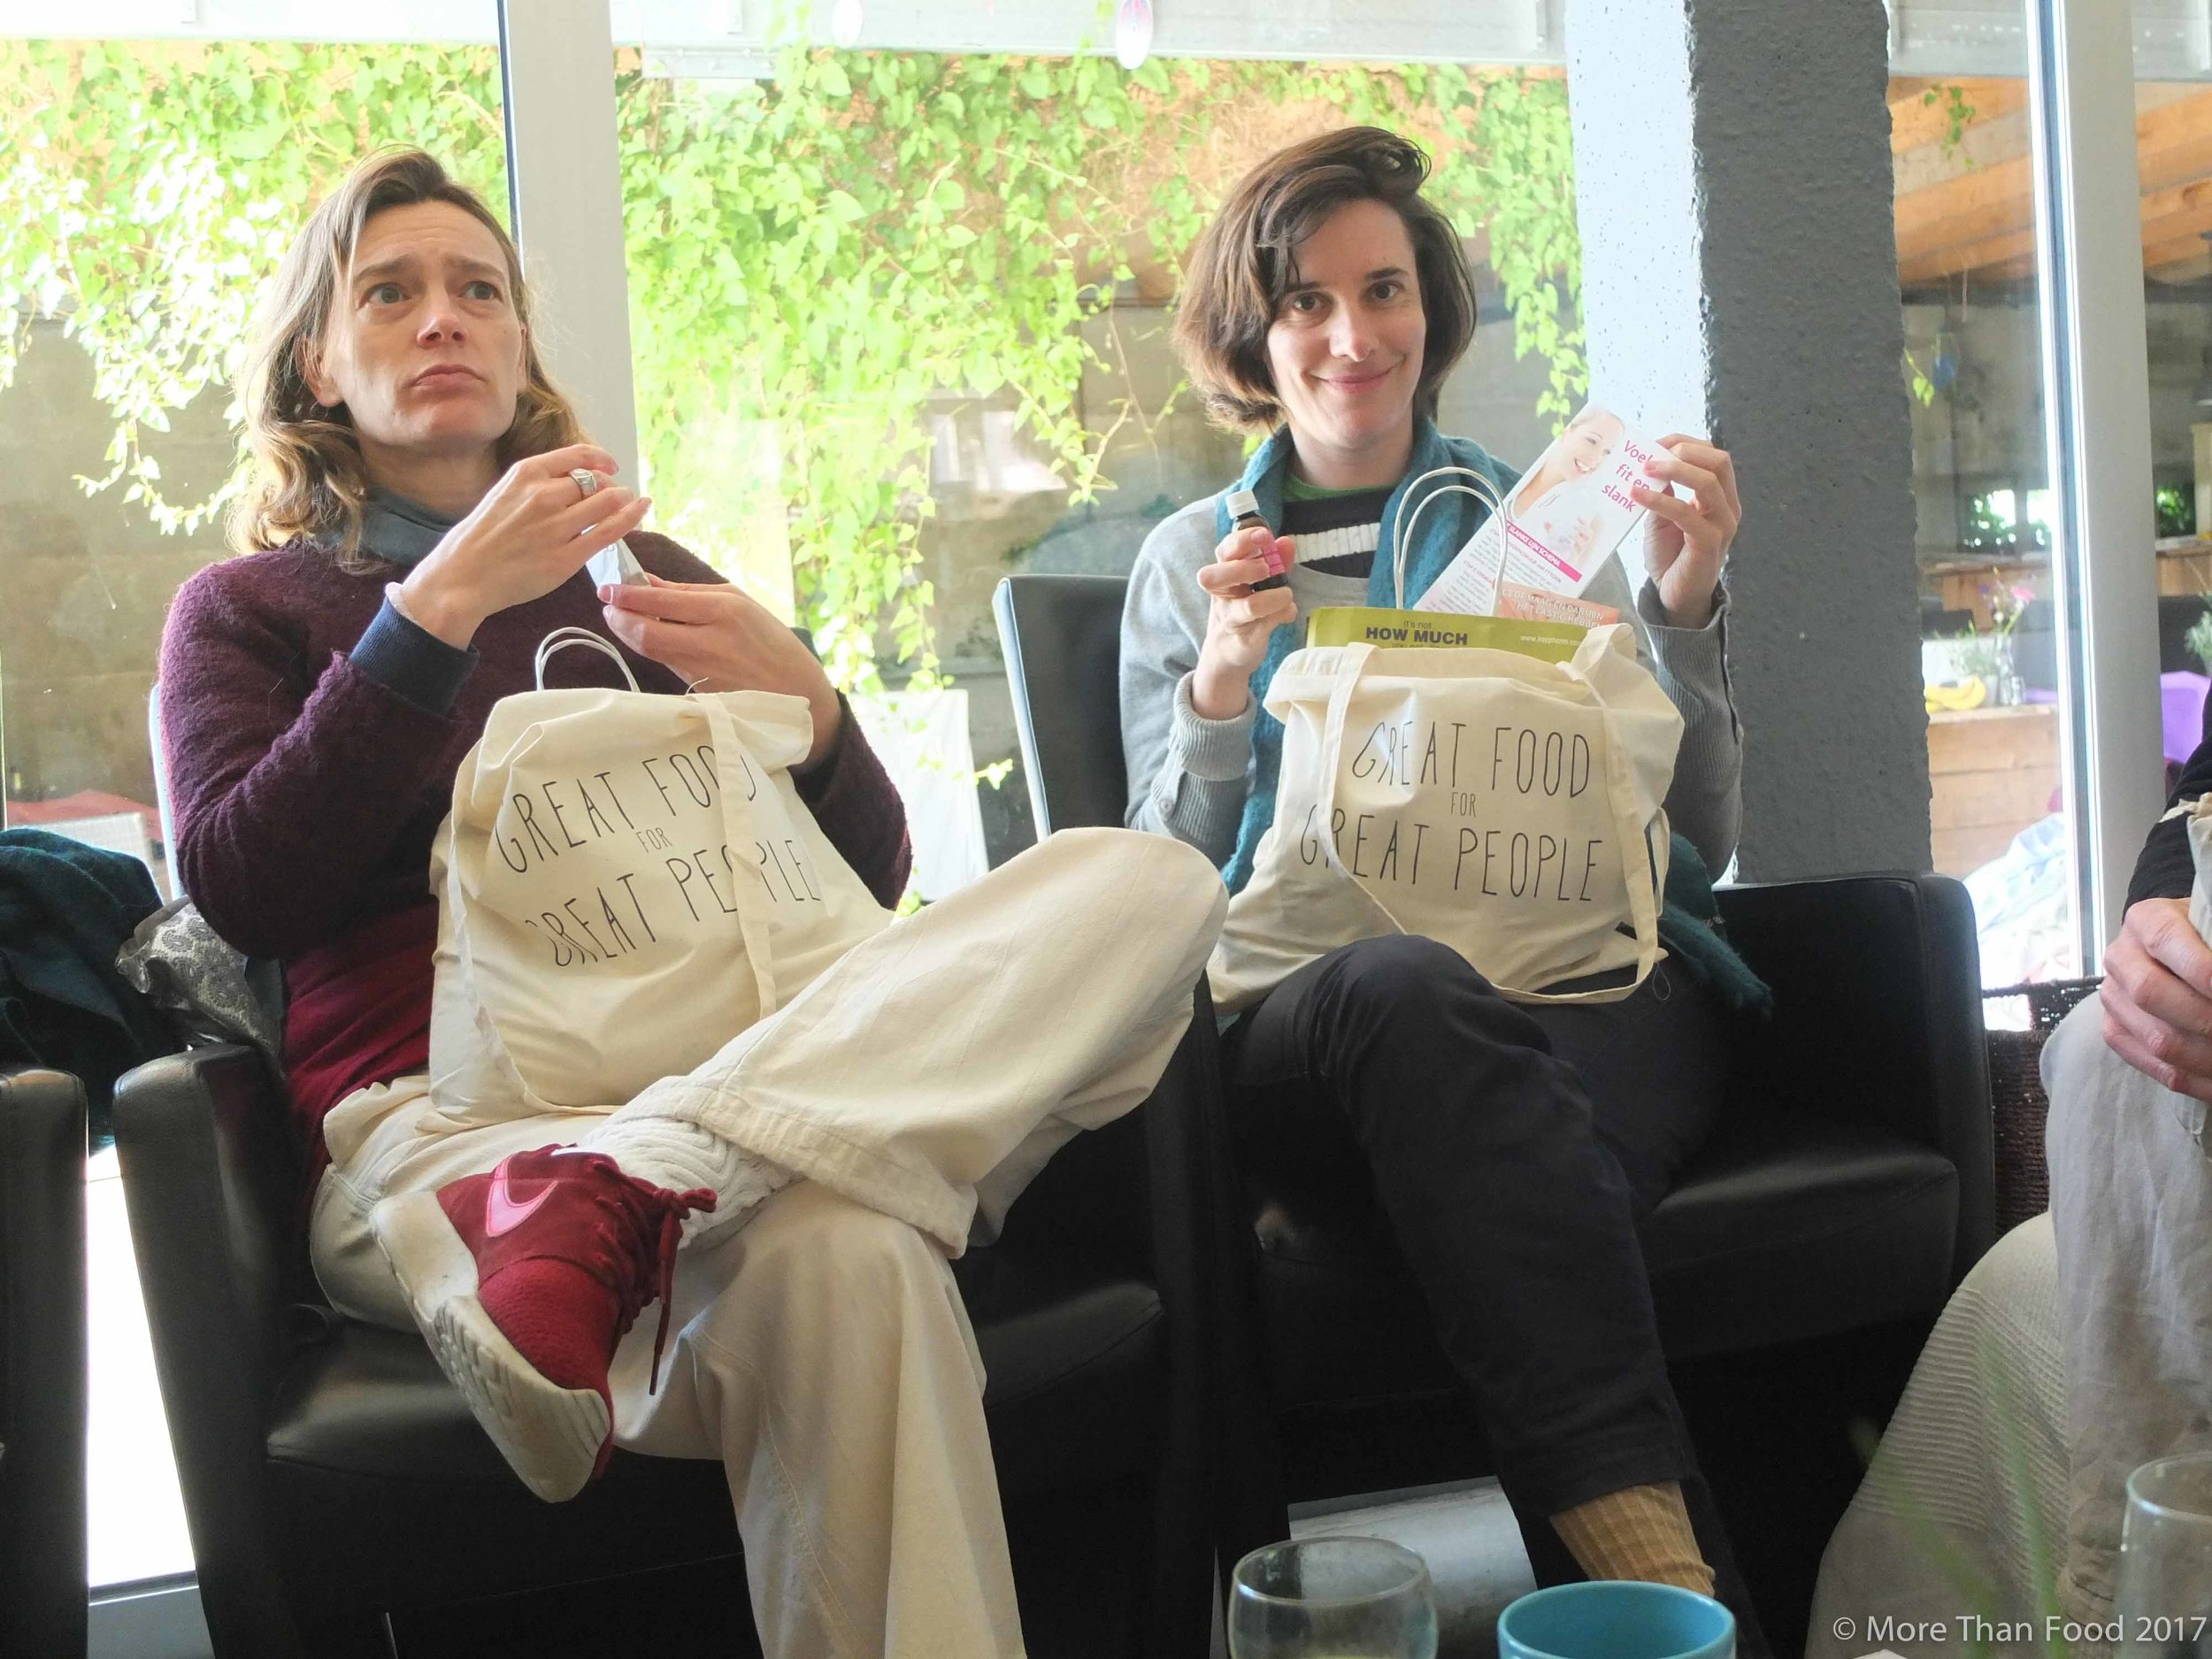 Surprises for great people: kokoswater en nori snacks (Kulau), superfoods (Biotona), ecologisch afwasproduct (Ecover) kruidentheetjes (Physalis), suikervrije granola (Xavies), kruidenzout (by Emilie), lavendelzakje (by Els),...